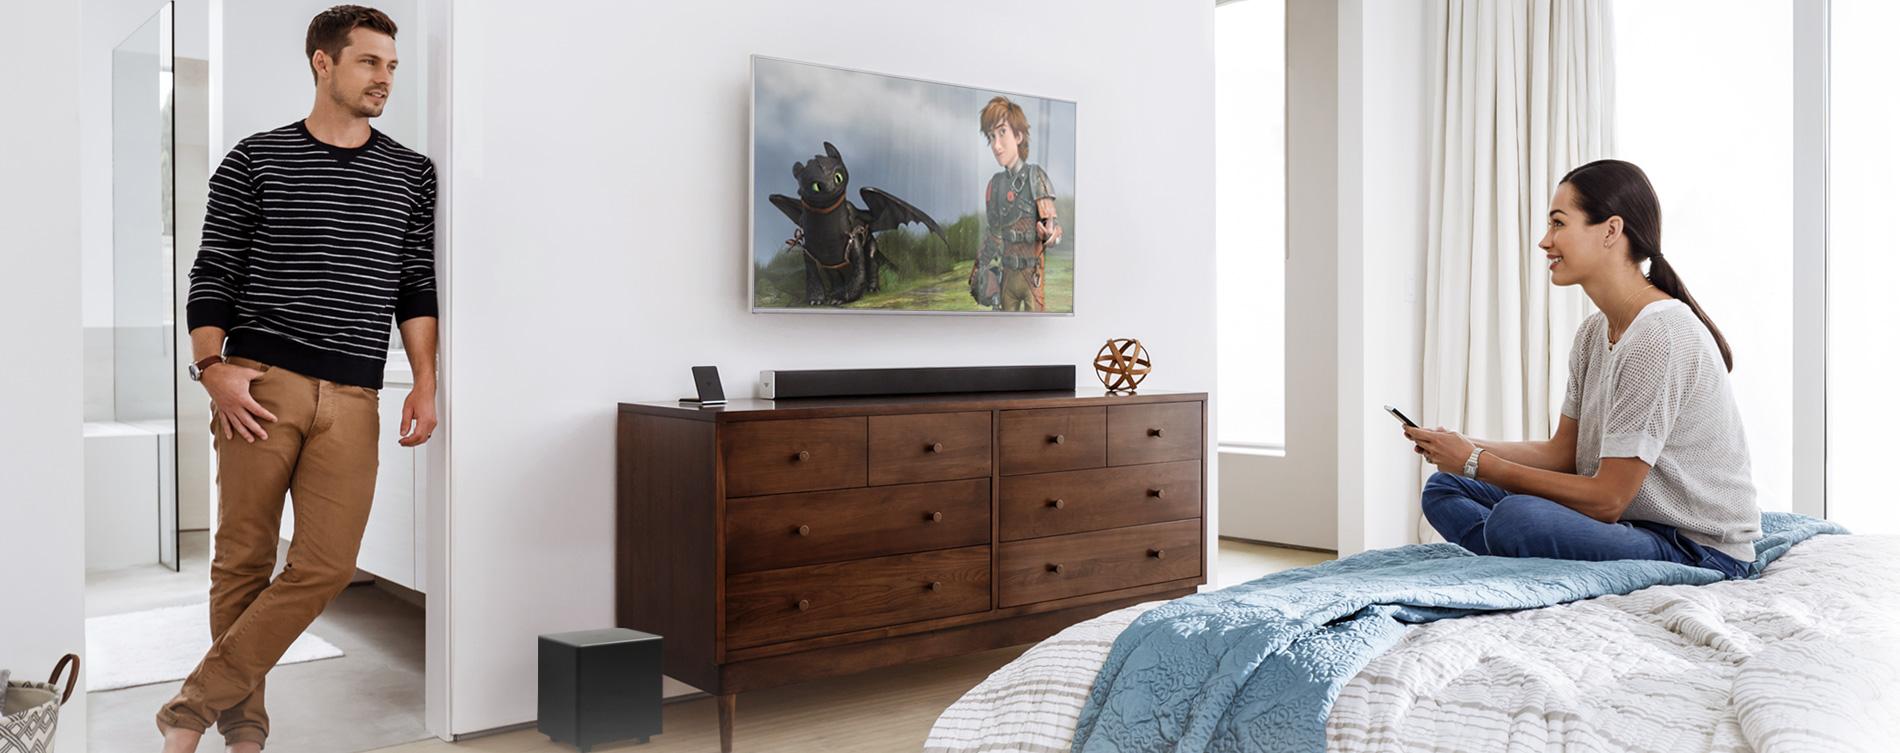 Vizio Smartcast 38 2 1 Sound Bar System Sb3821 D6 Vizio